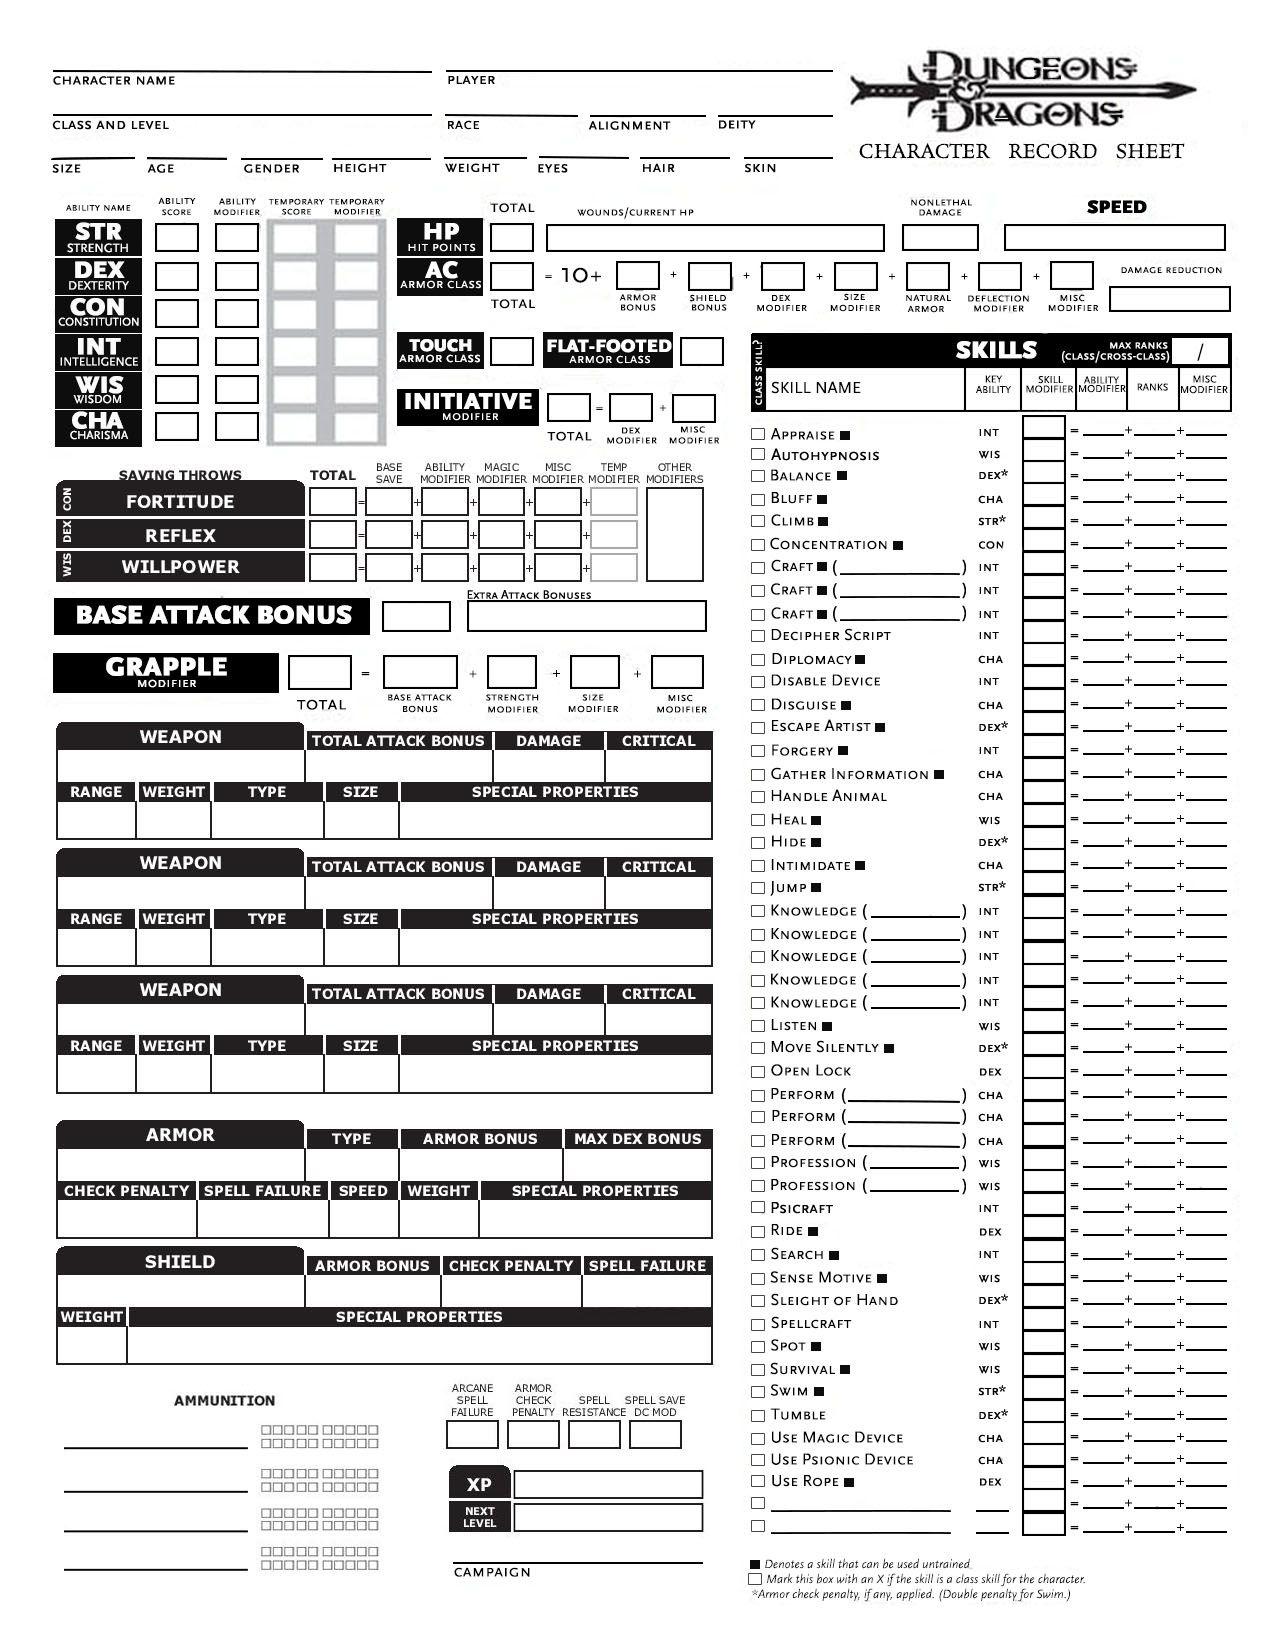 DnD 5E Character Sheet Fillable, Editable PDF Download ...